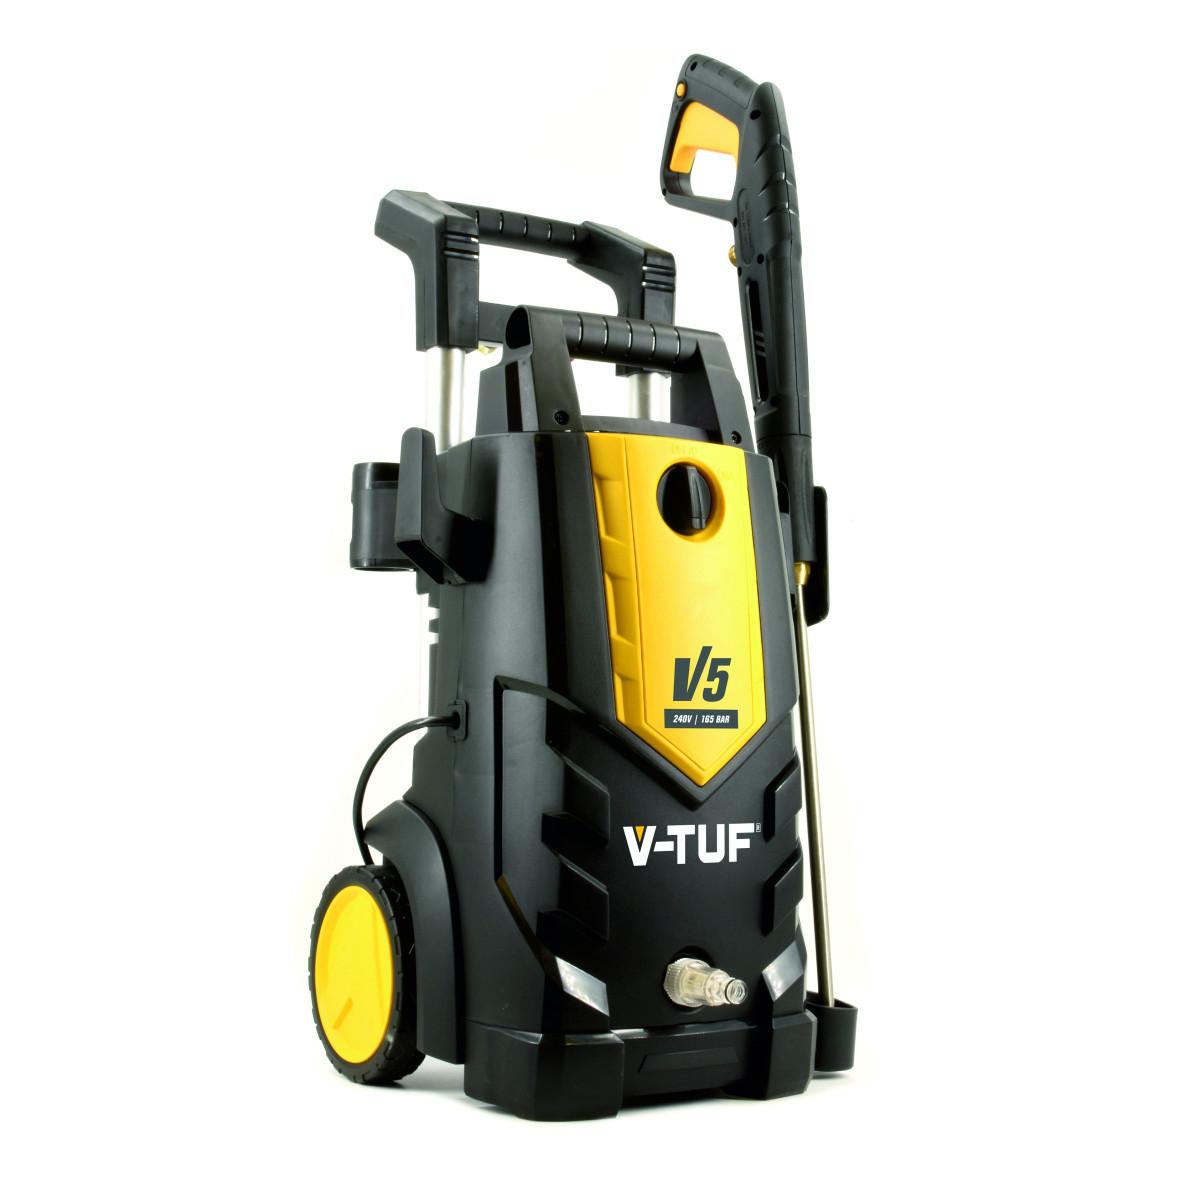 V-TUF V5 240v Tough Electric Pressure Washer - 2400psi, 165Bar, 7.2L/min